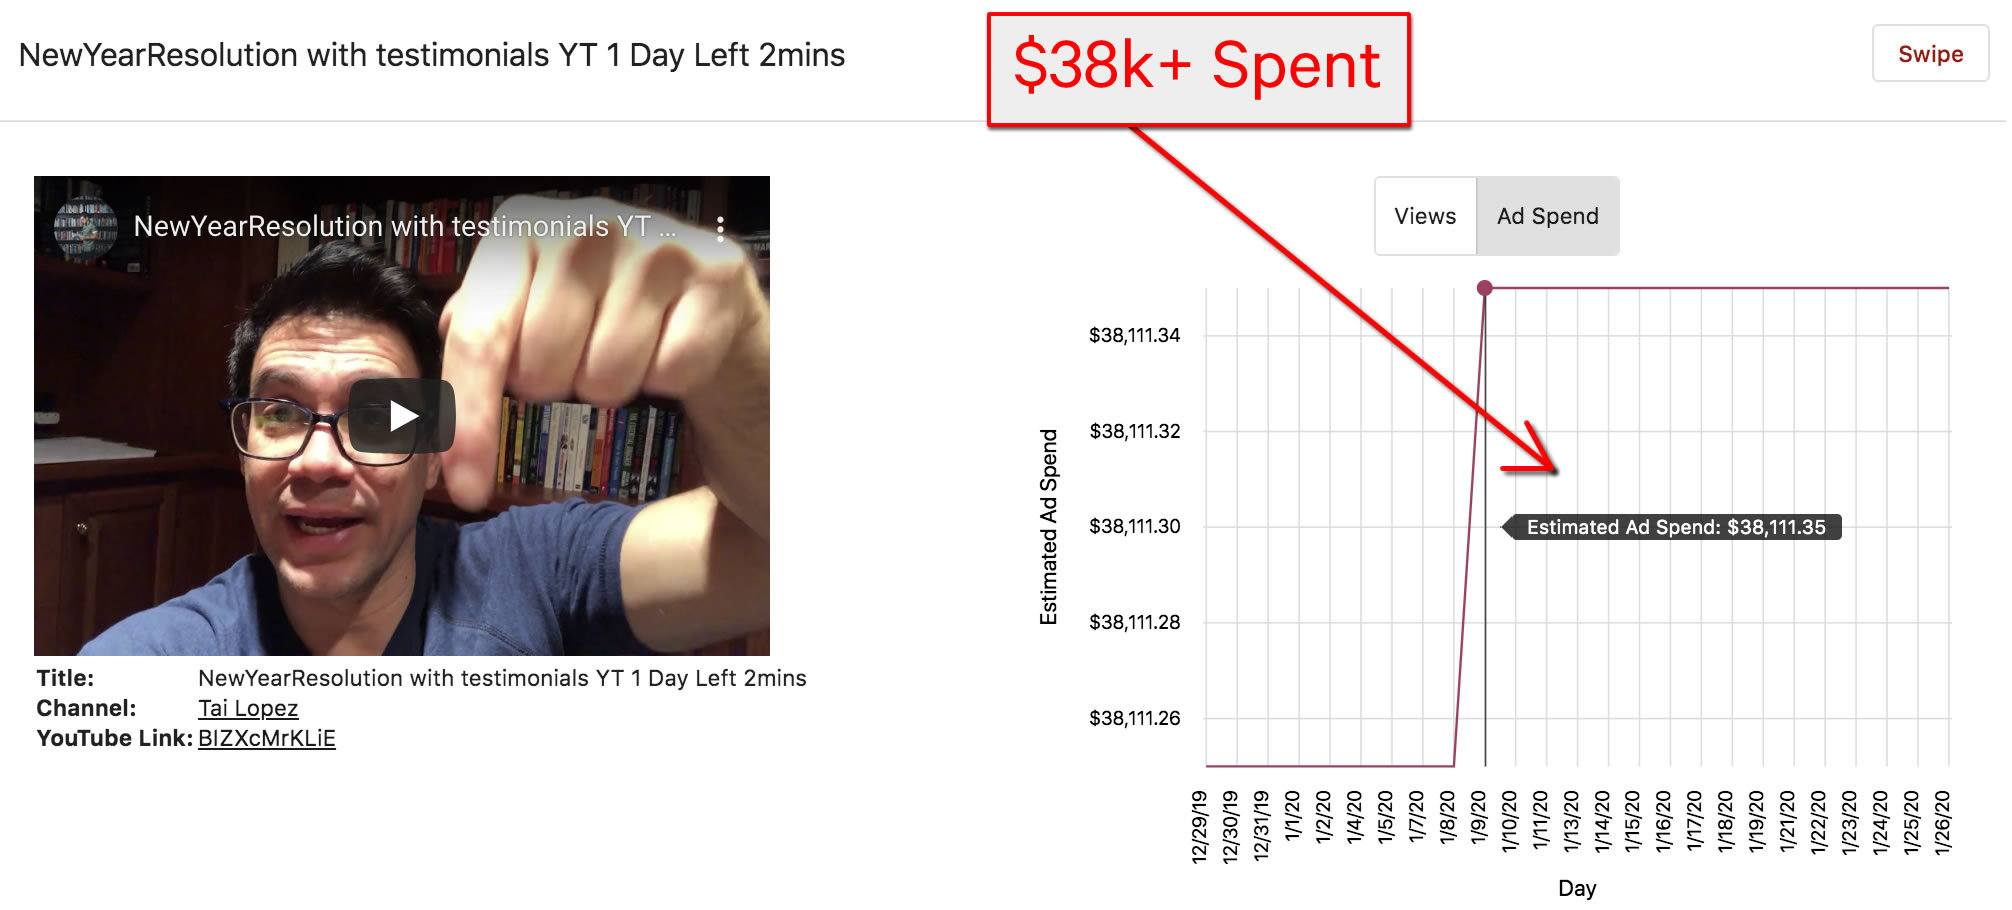 youtube-ad-spy-tool-screenshot-tailopez-1day-20200126